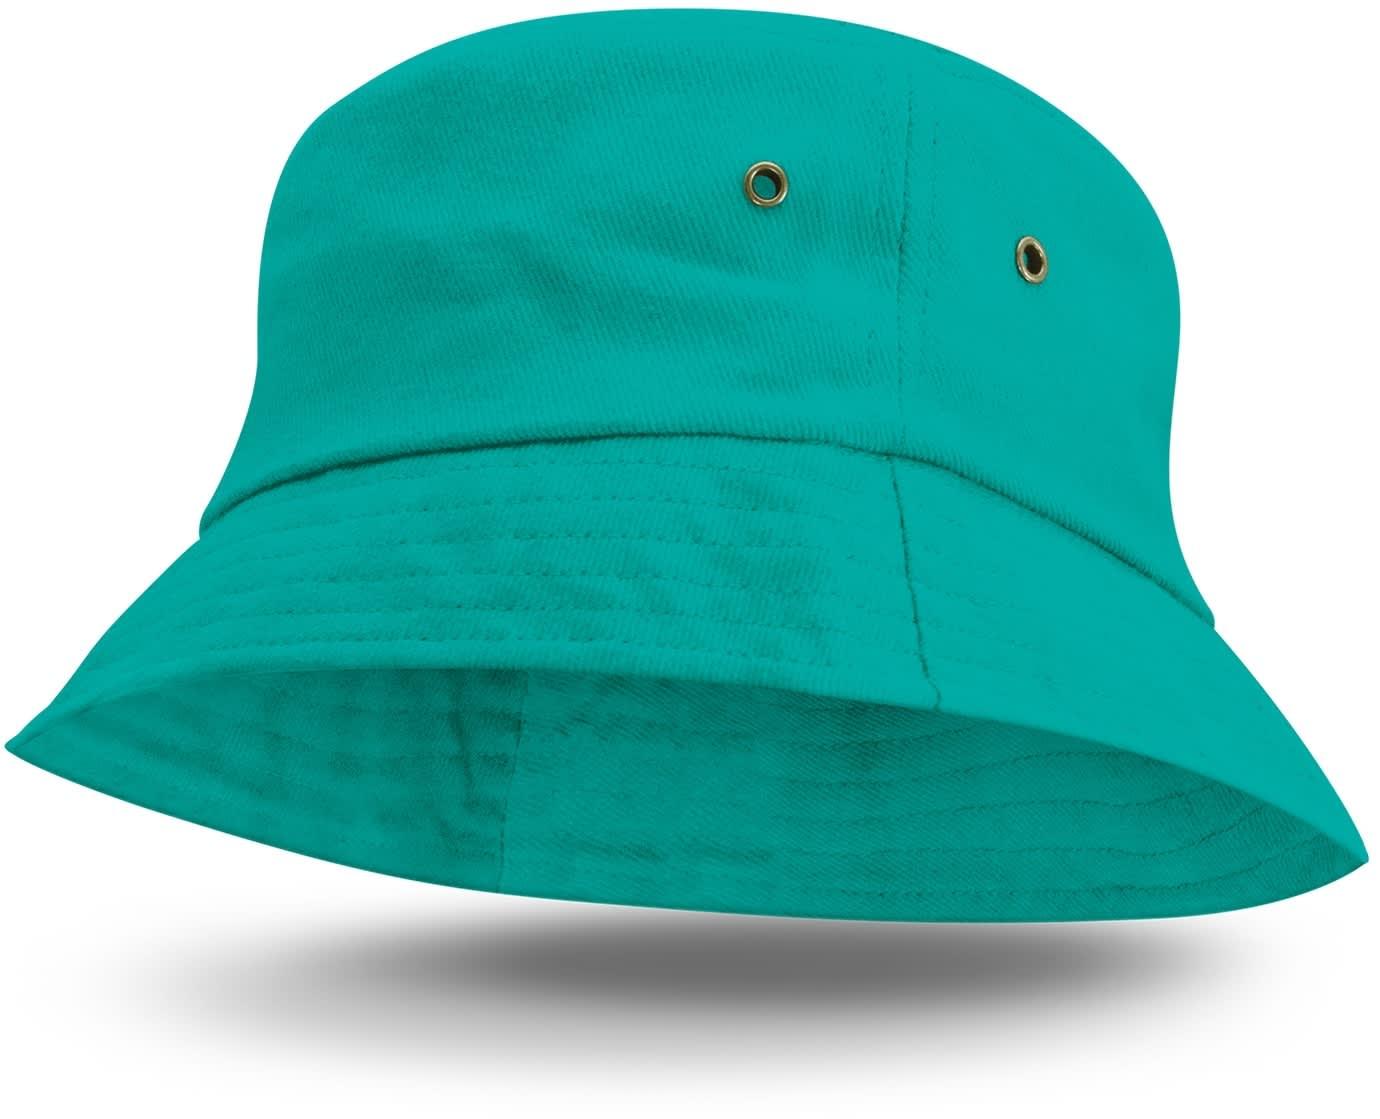 Teal Bondi Premium Bucket Hat